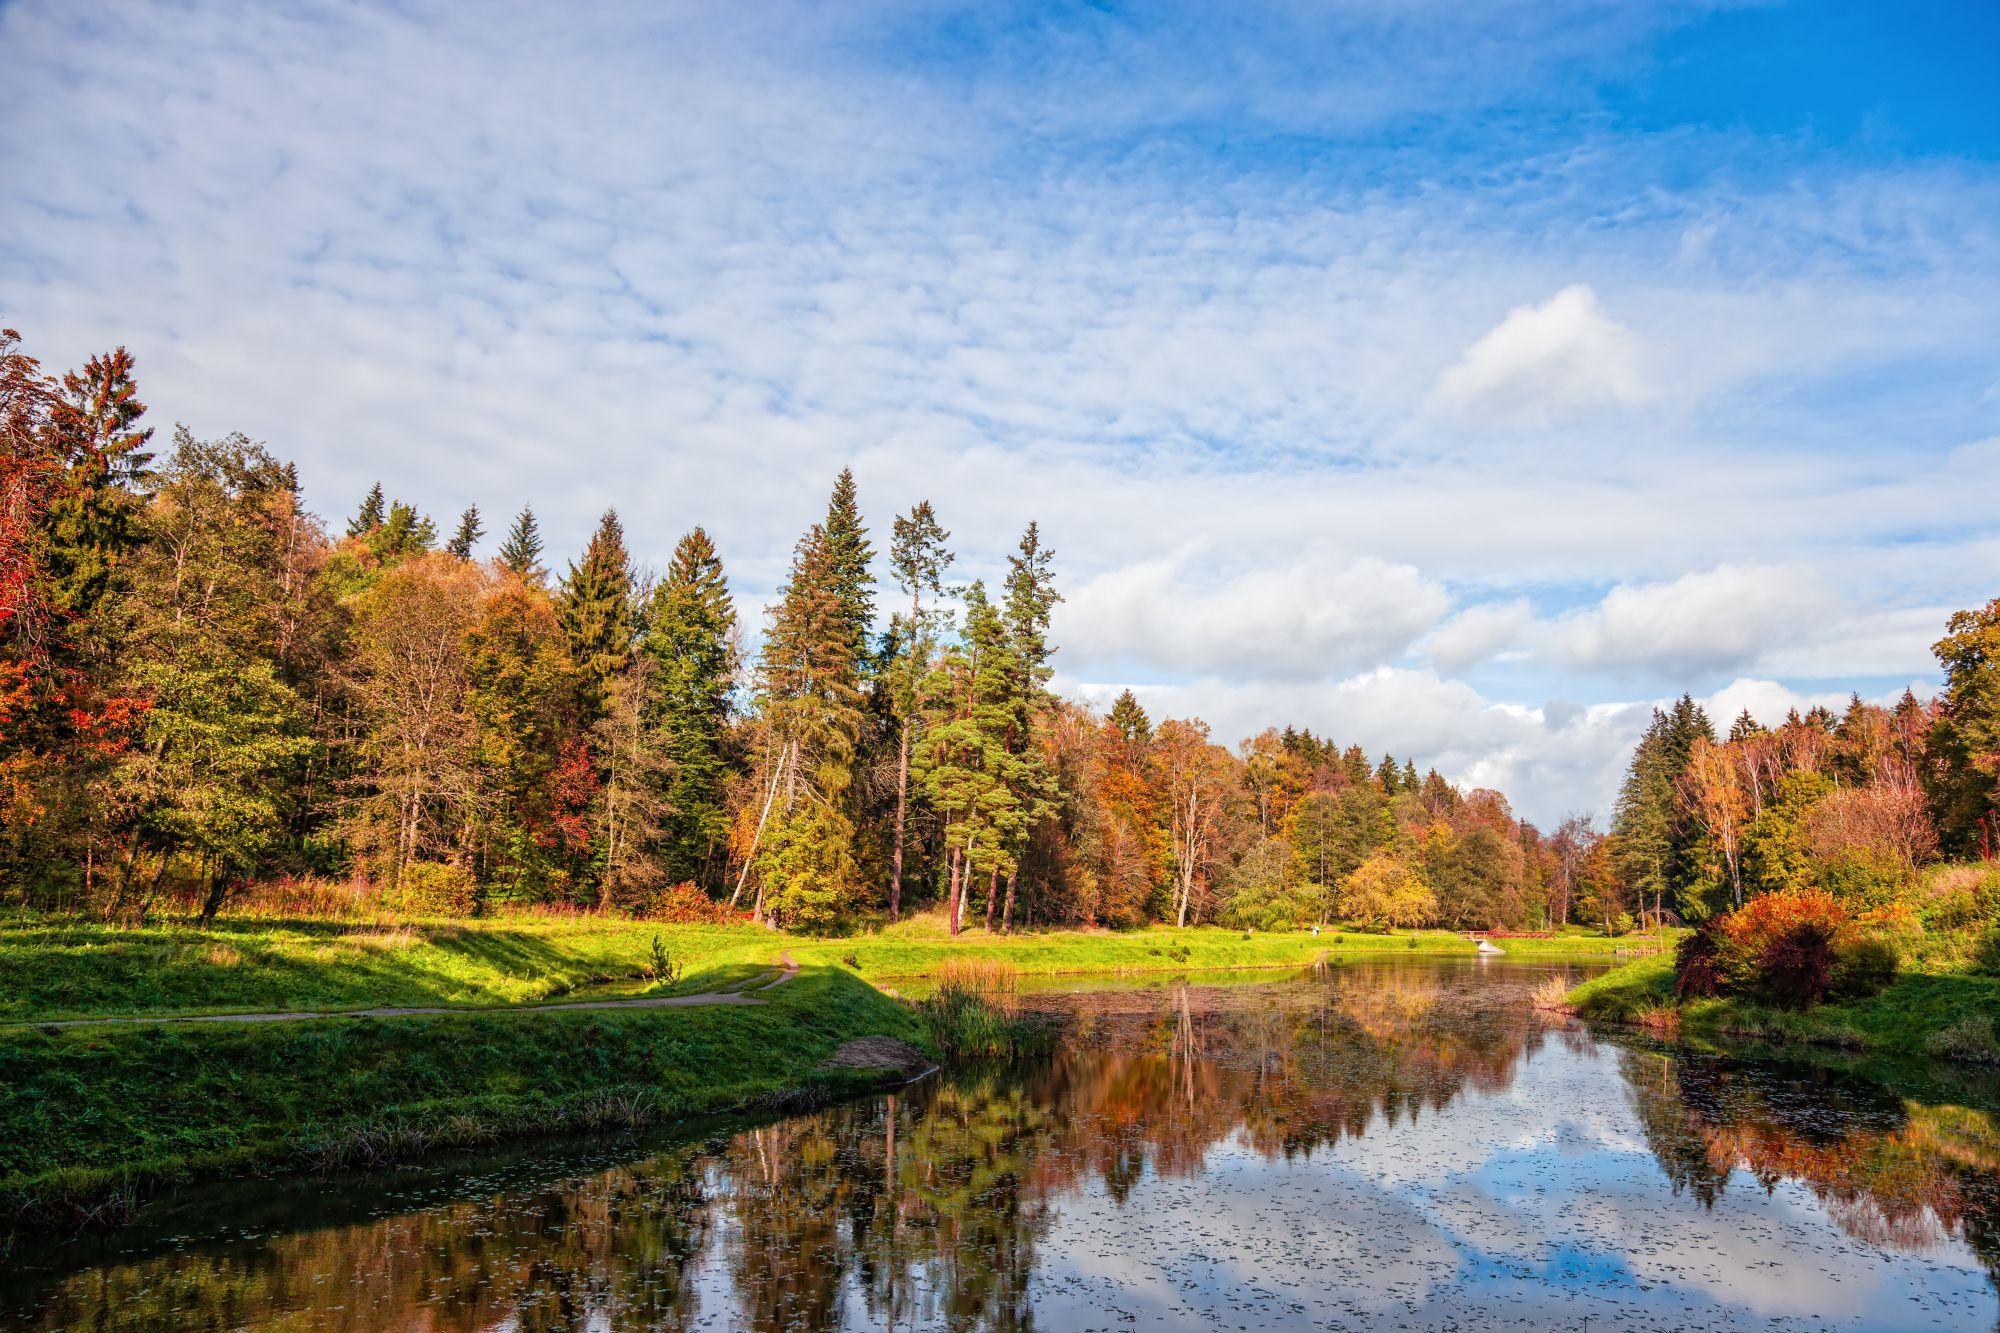 Widok lasu i rzeki